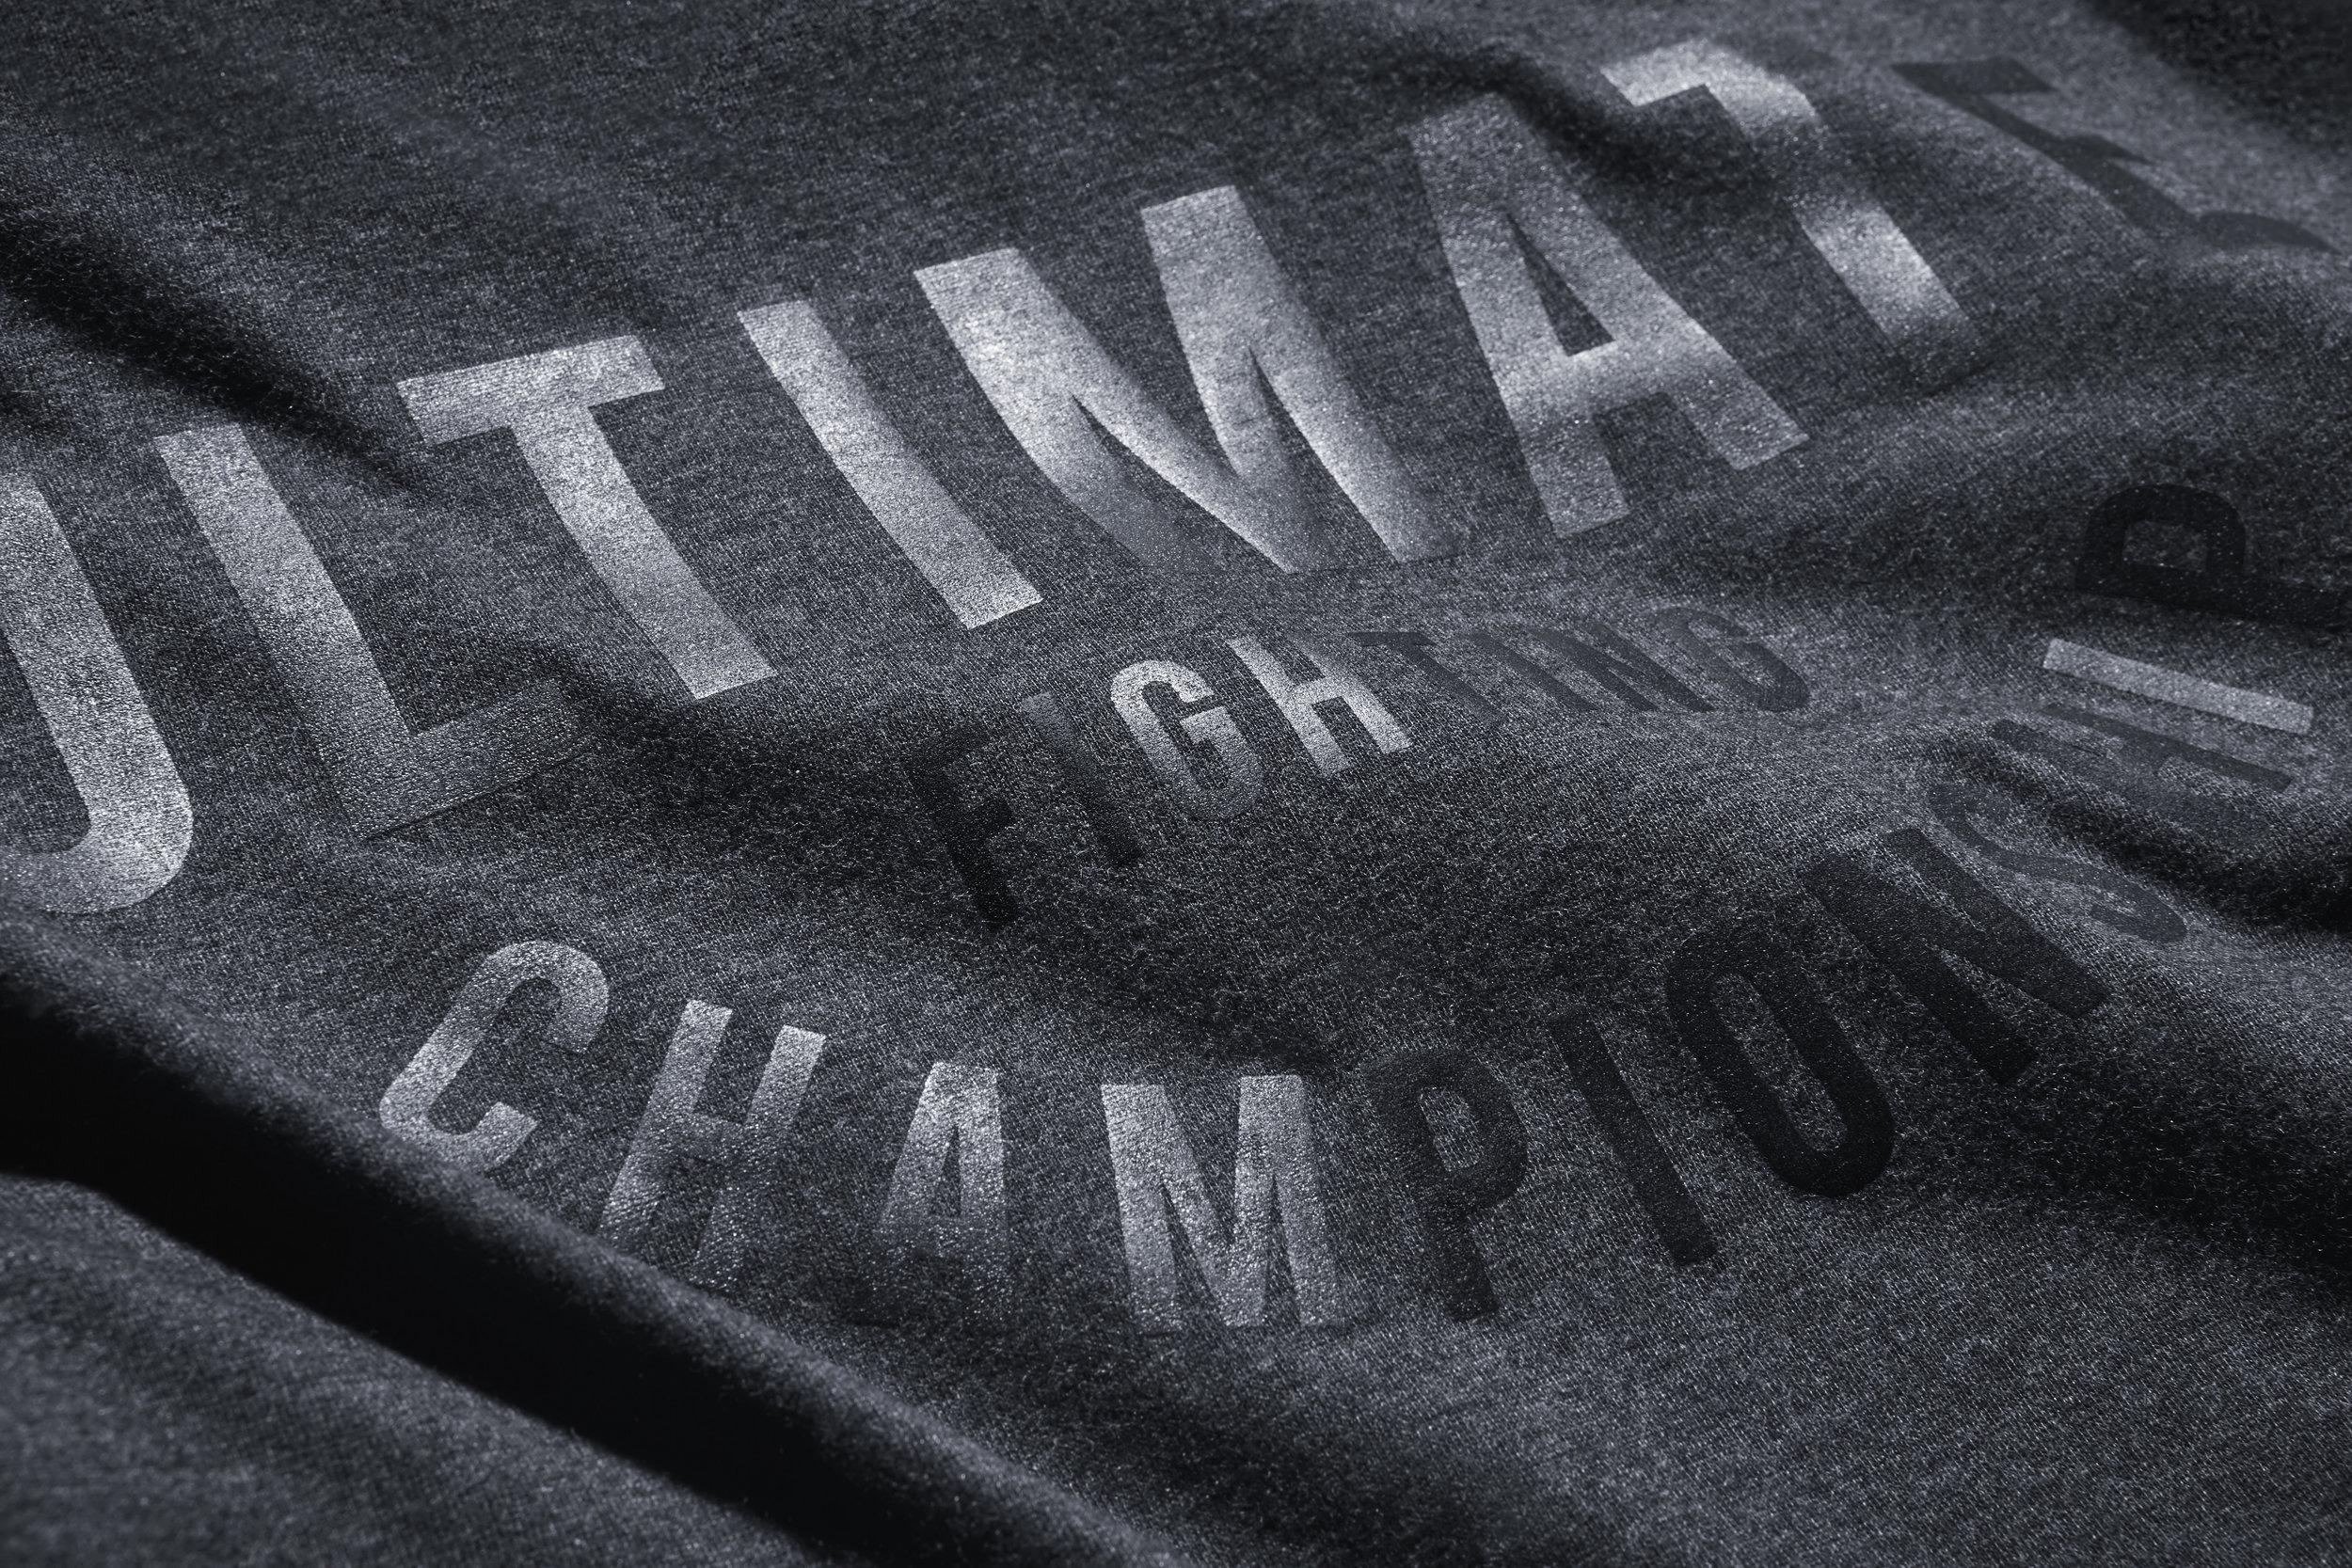 C21101_FW17_UFC_FNC_Tee_Black_Chest_Detail.jpg